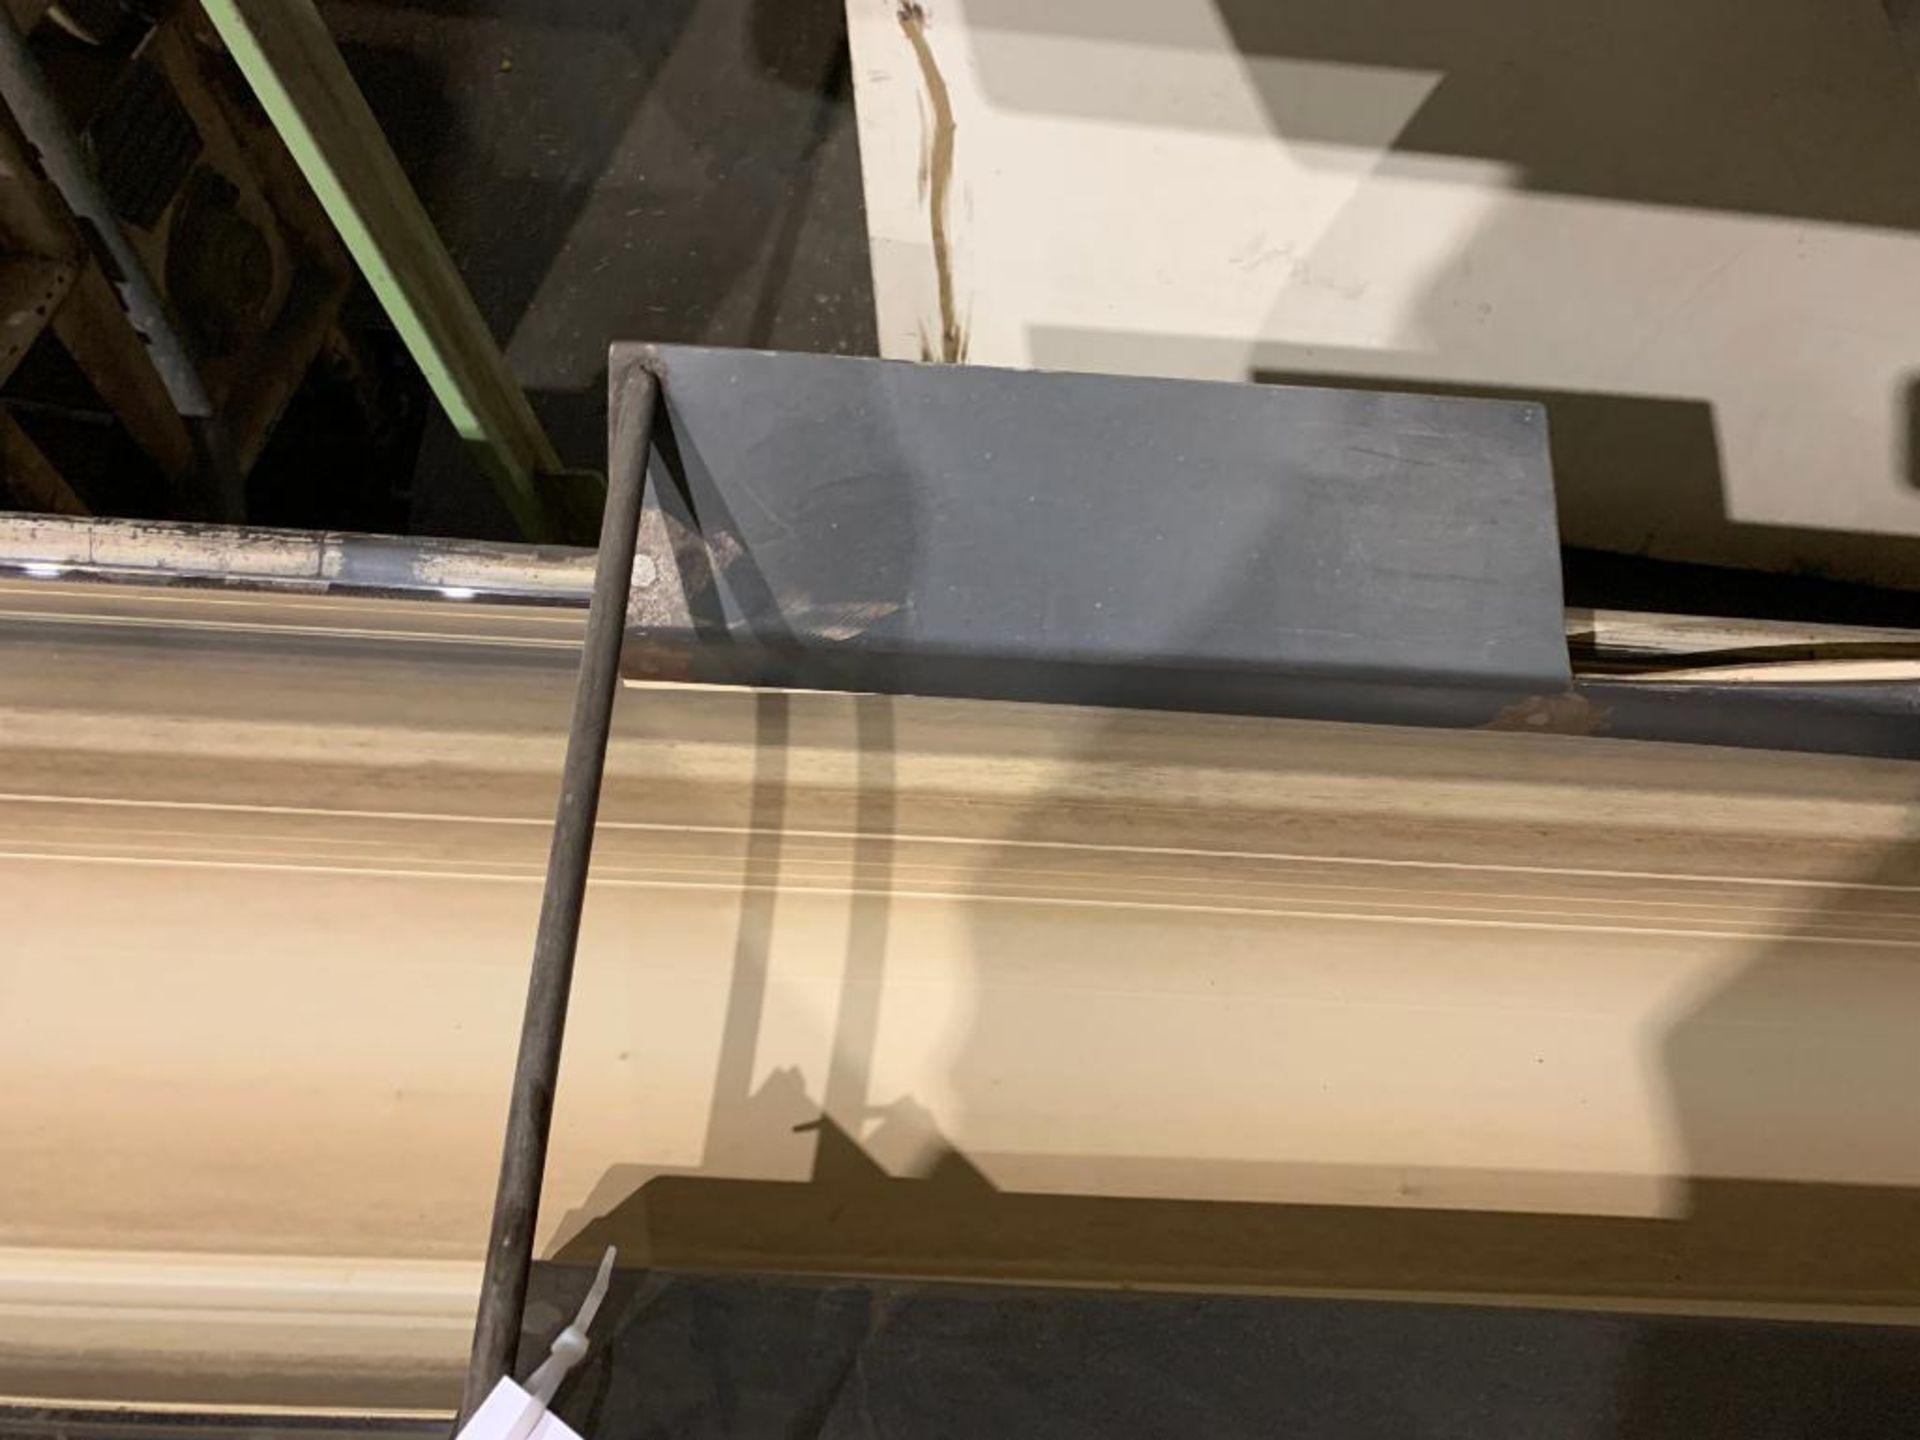 mild steel conveyor - Image 8 of 9